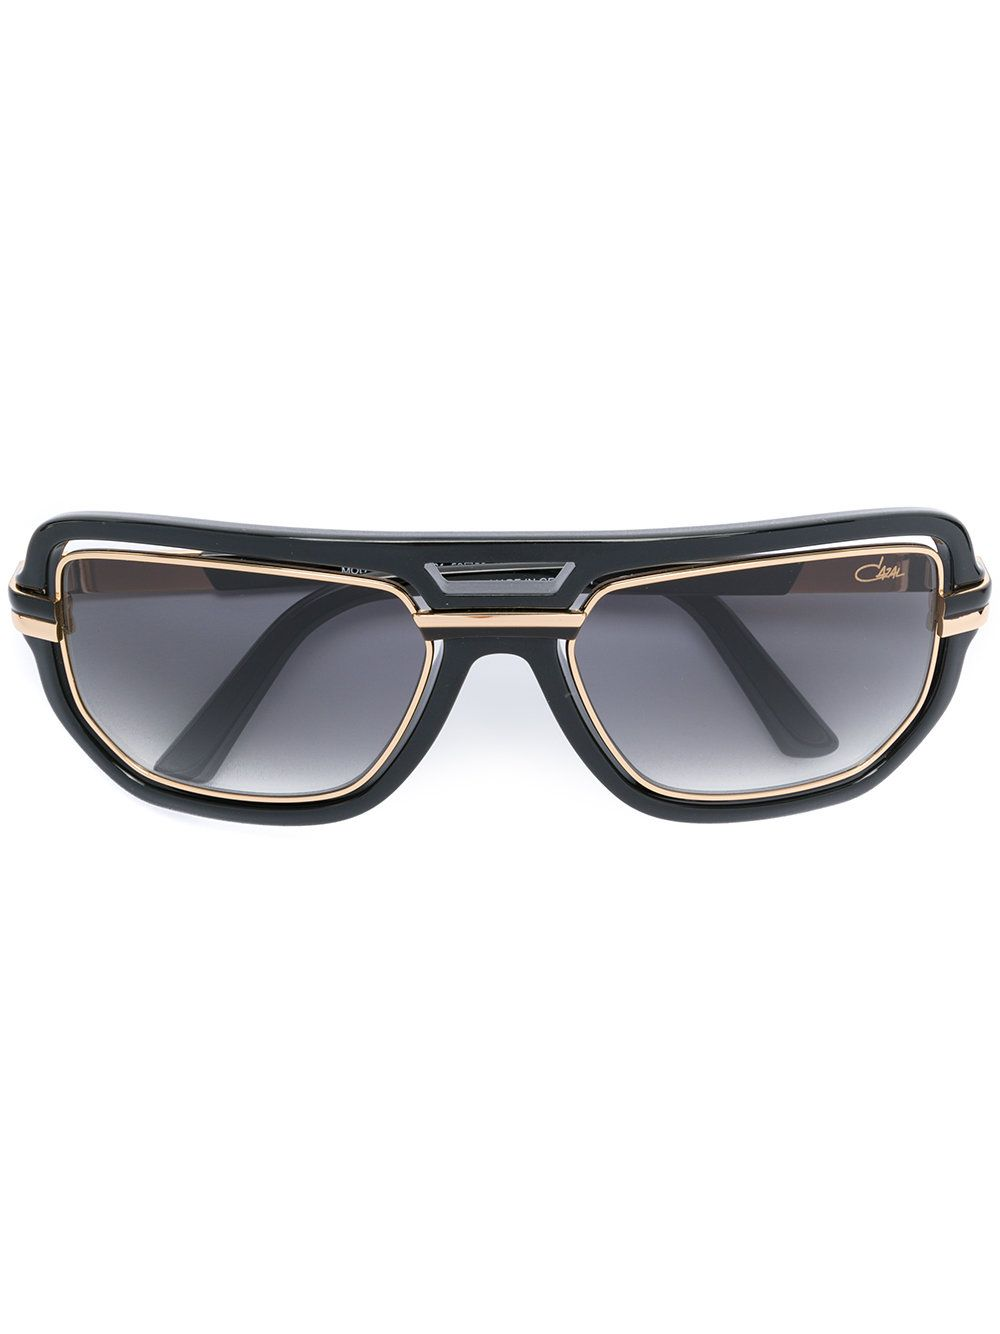 e2ed80f8b2ef Cazal vintage frame sunglasses pinterest eye jpg 1000x1334 Cazal vintage  frames